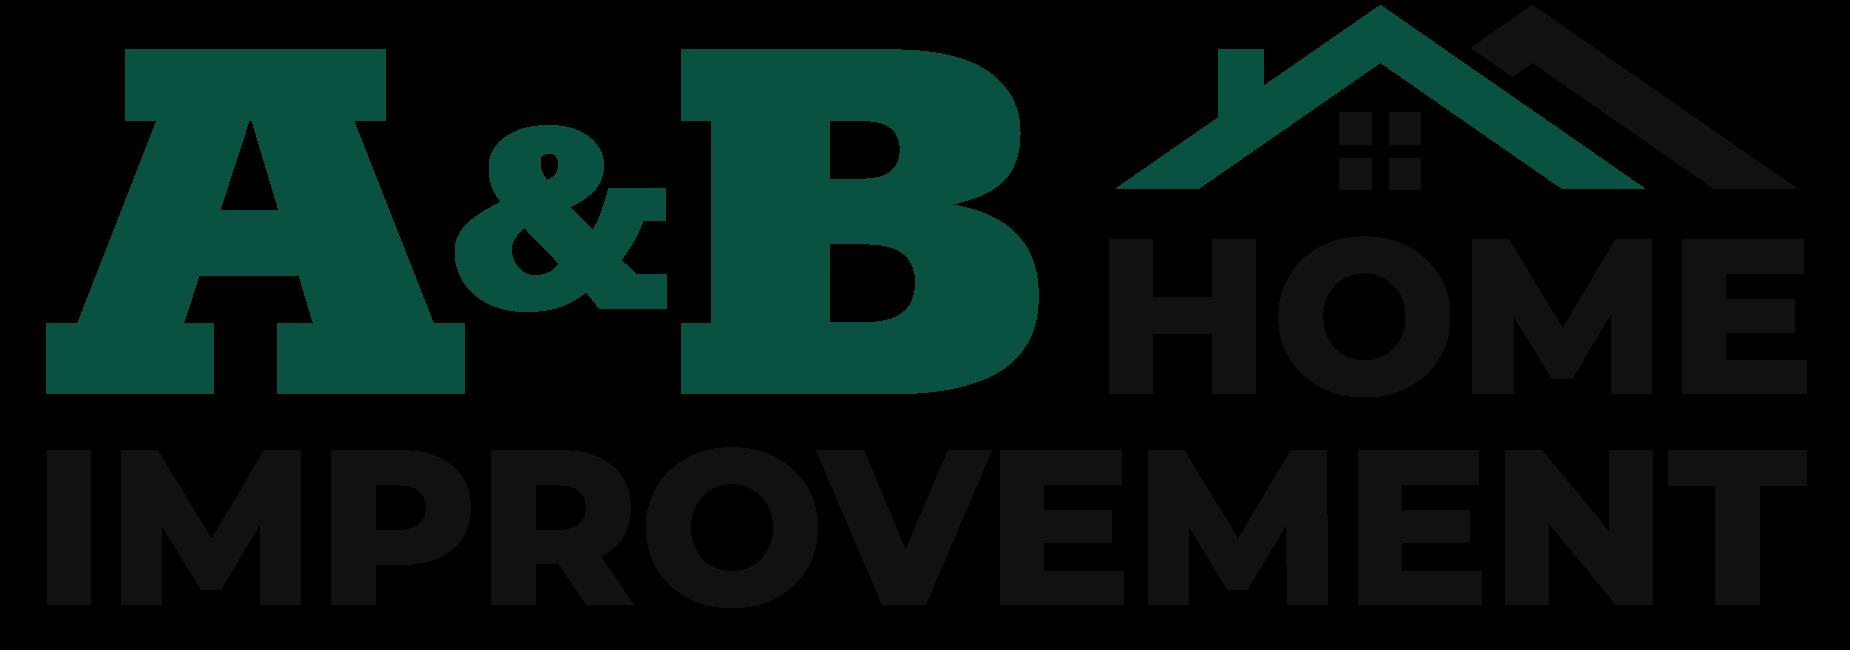 A & B Home Improvement logo